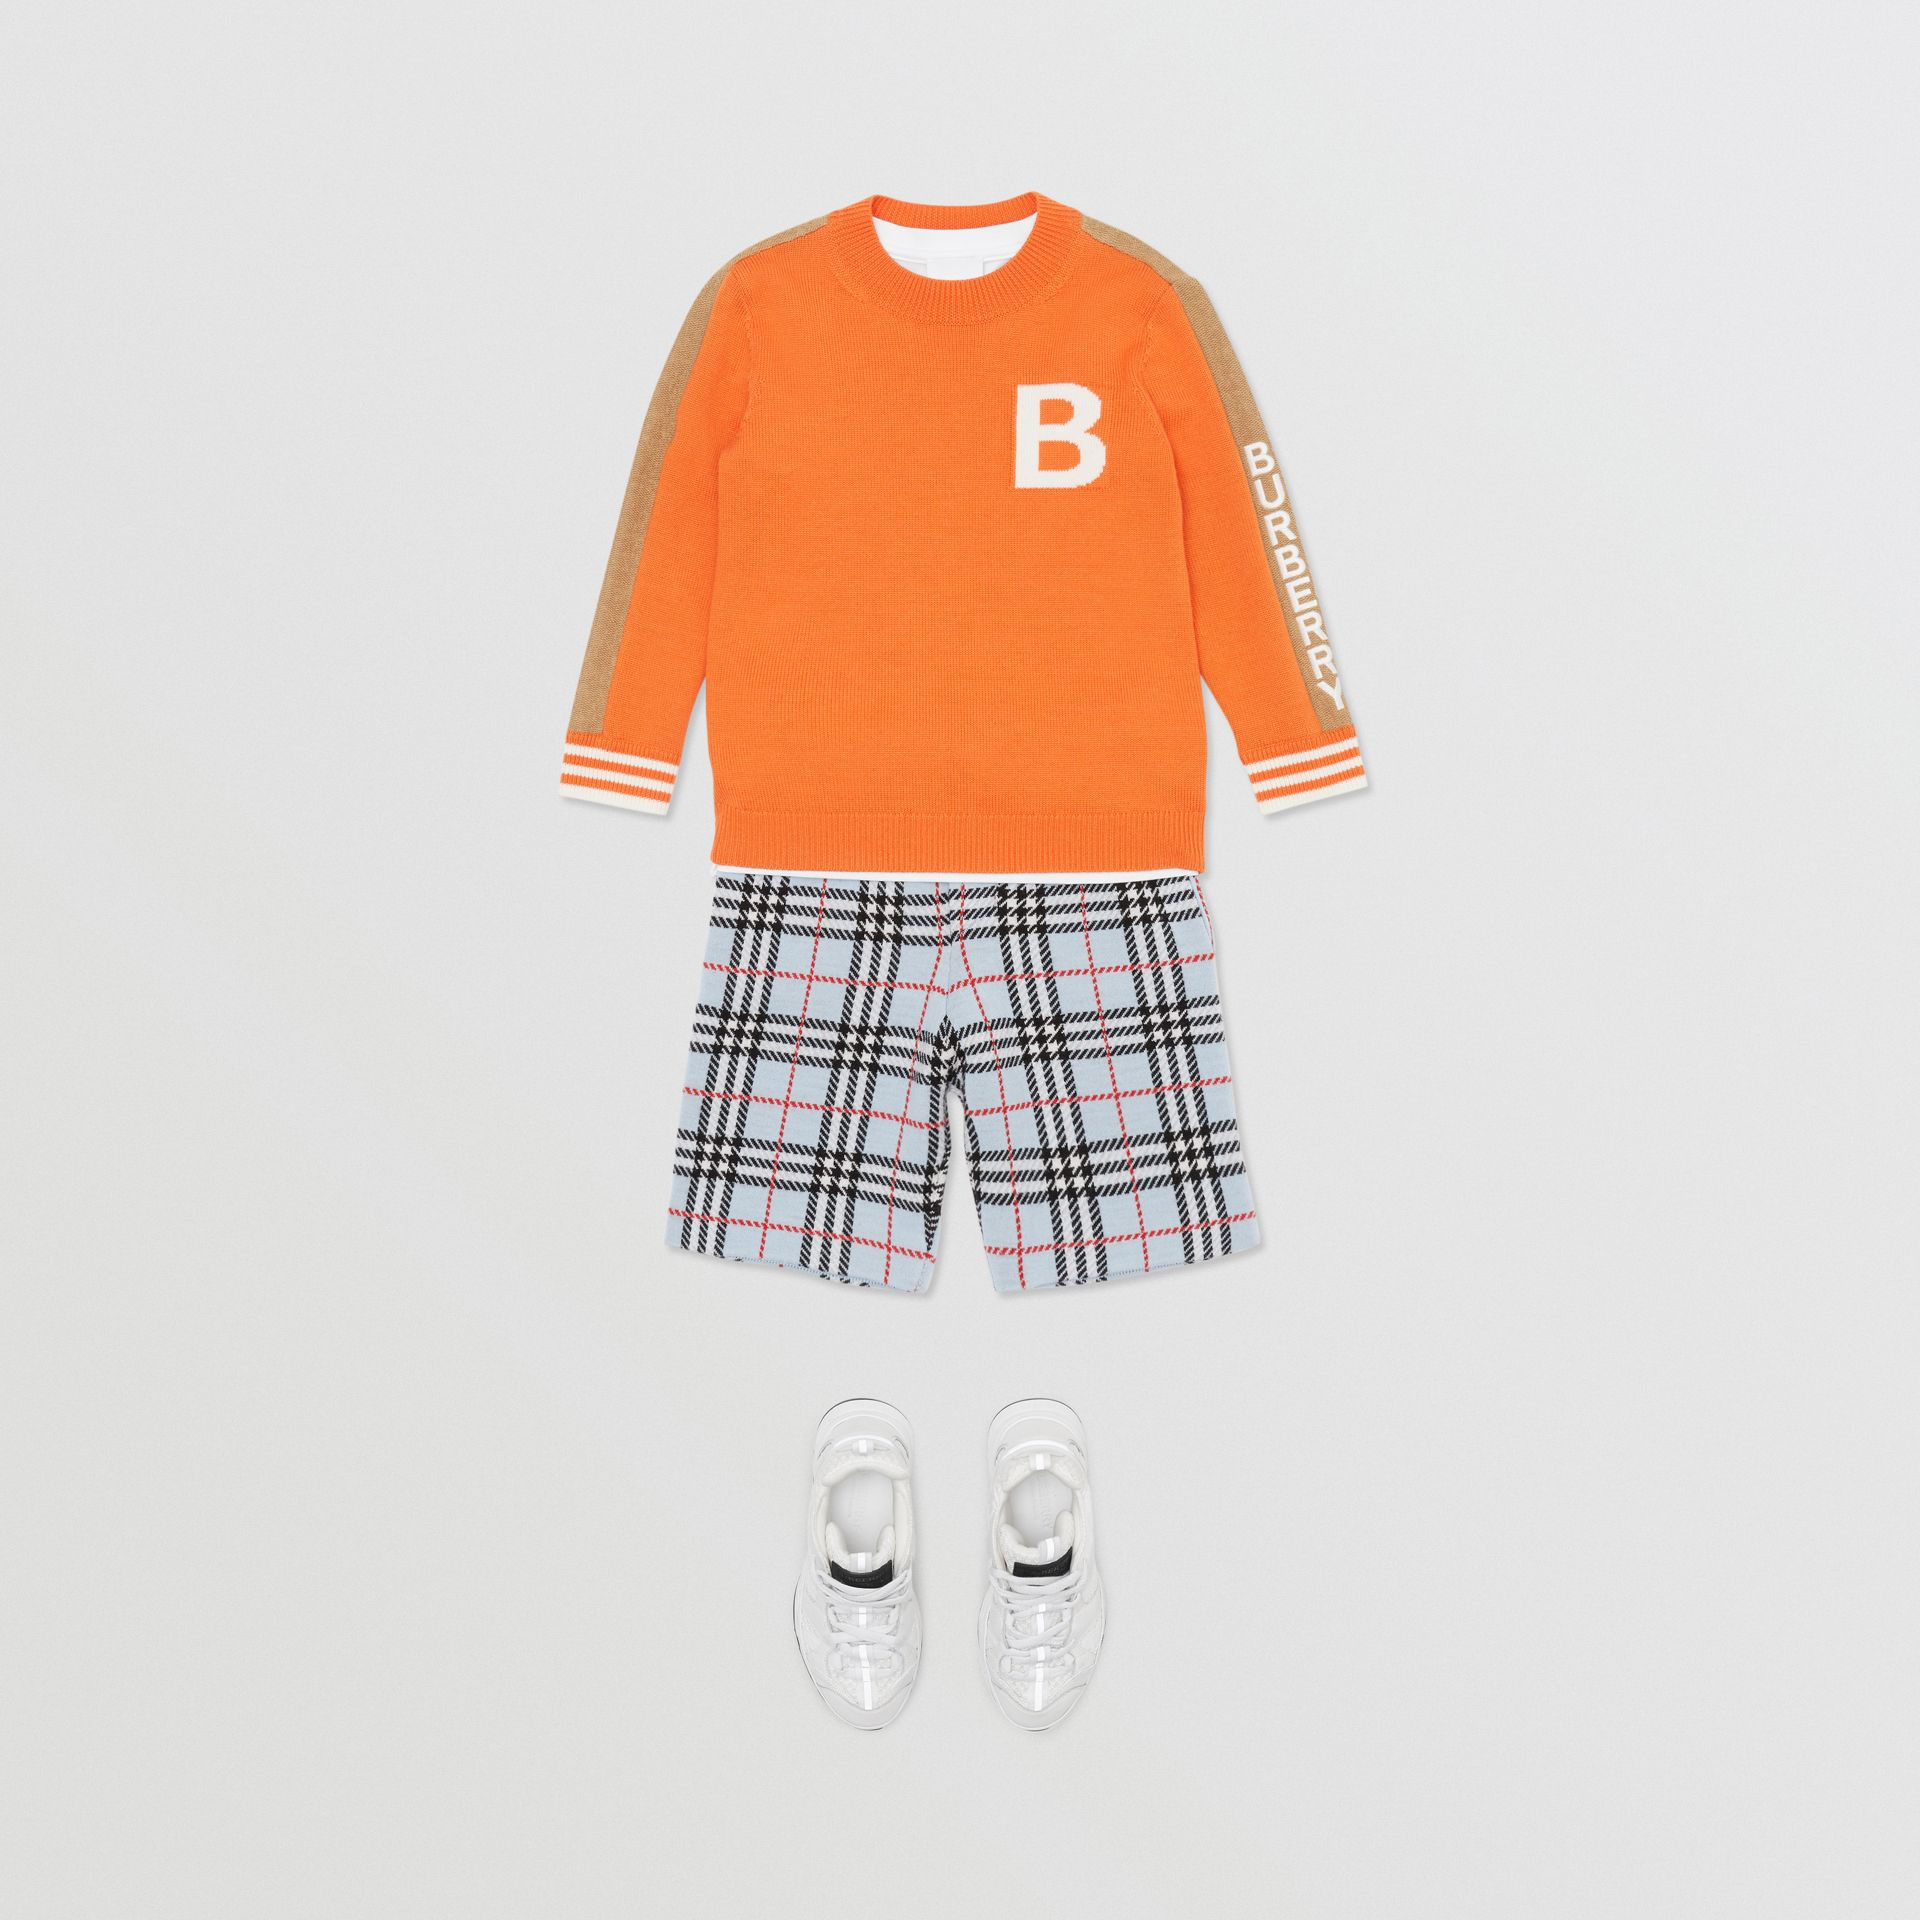 B Motif Merino Wool Jacquard Sweater in Bright Orange | Burberry United Kingdom - gallery image 3